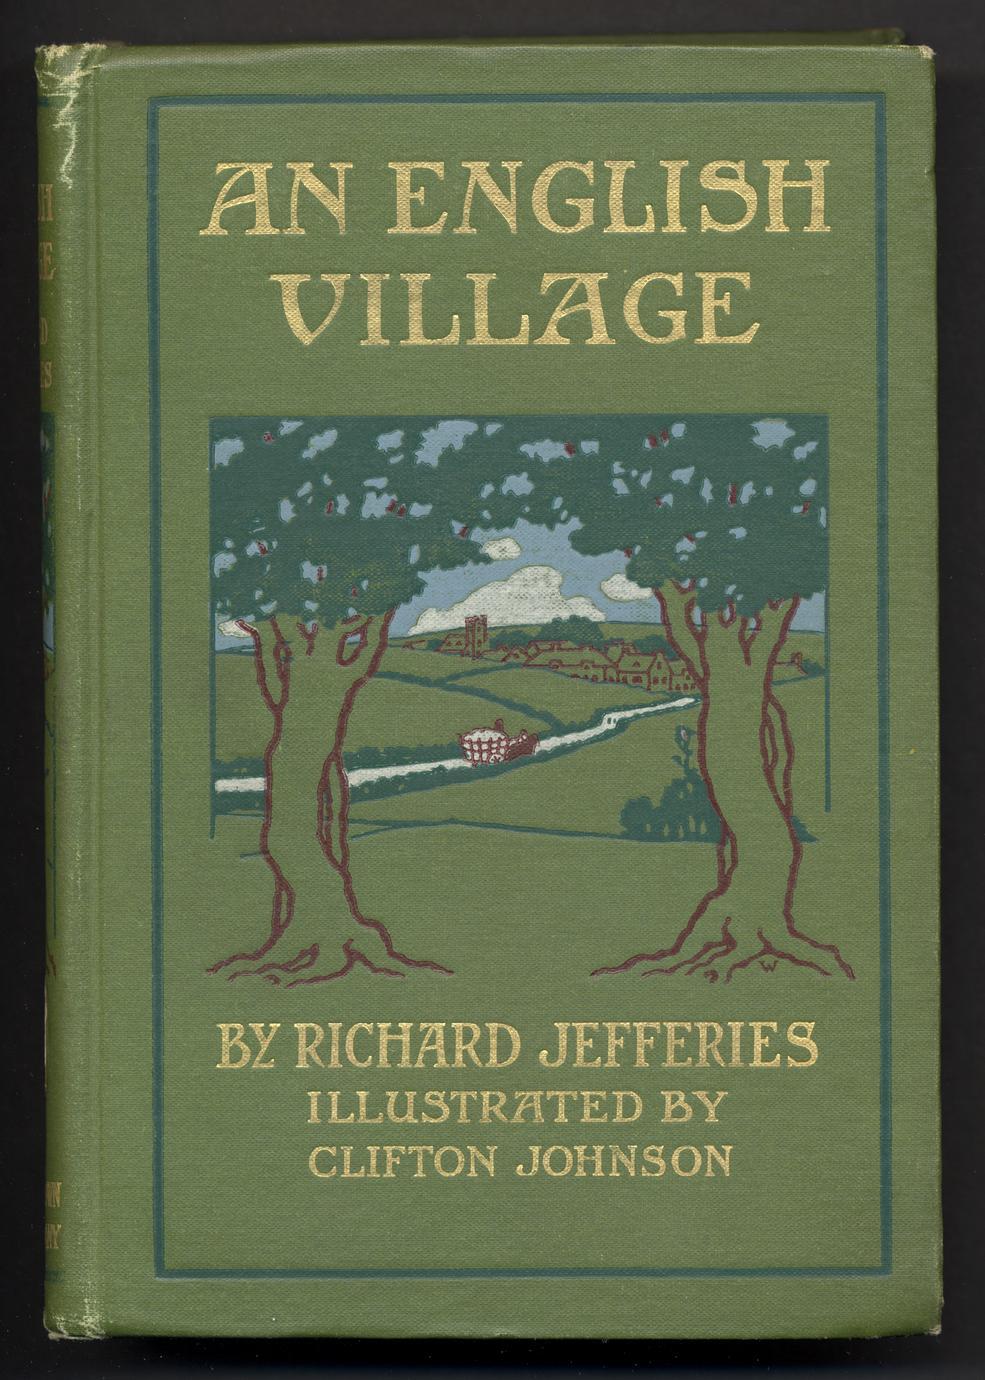 An English village (1 of 2)